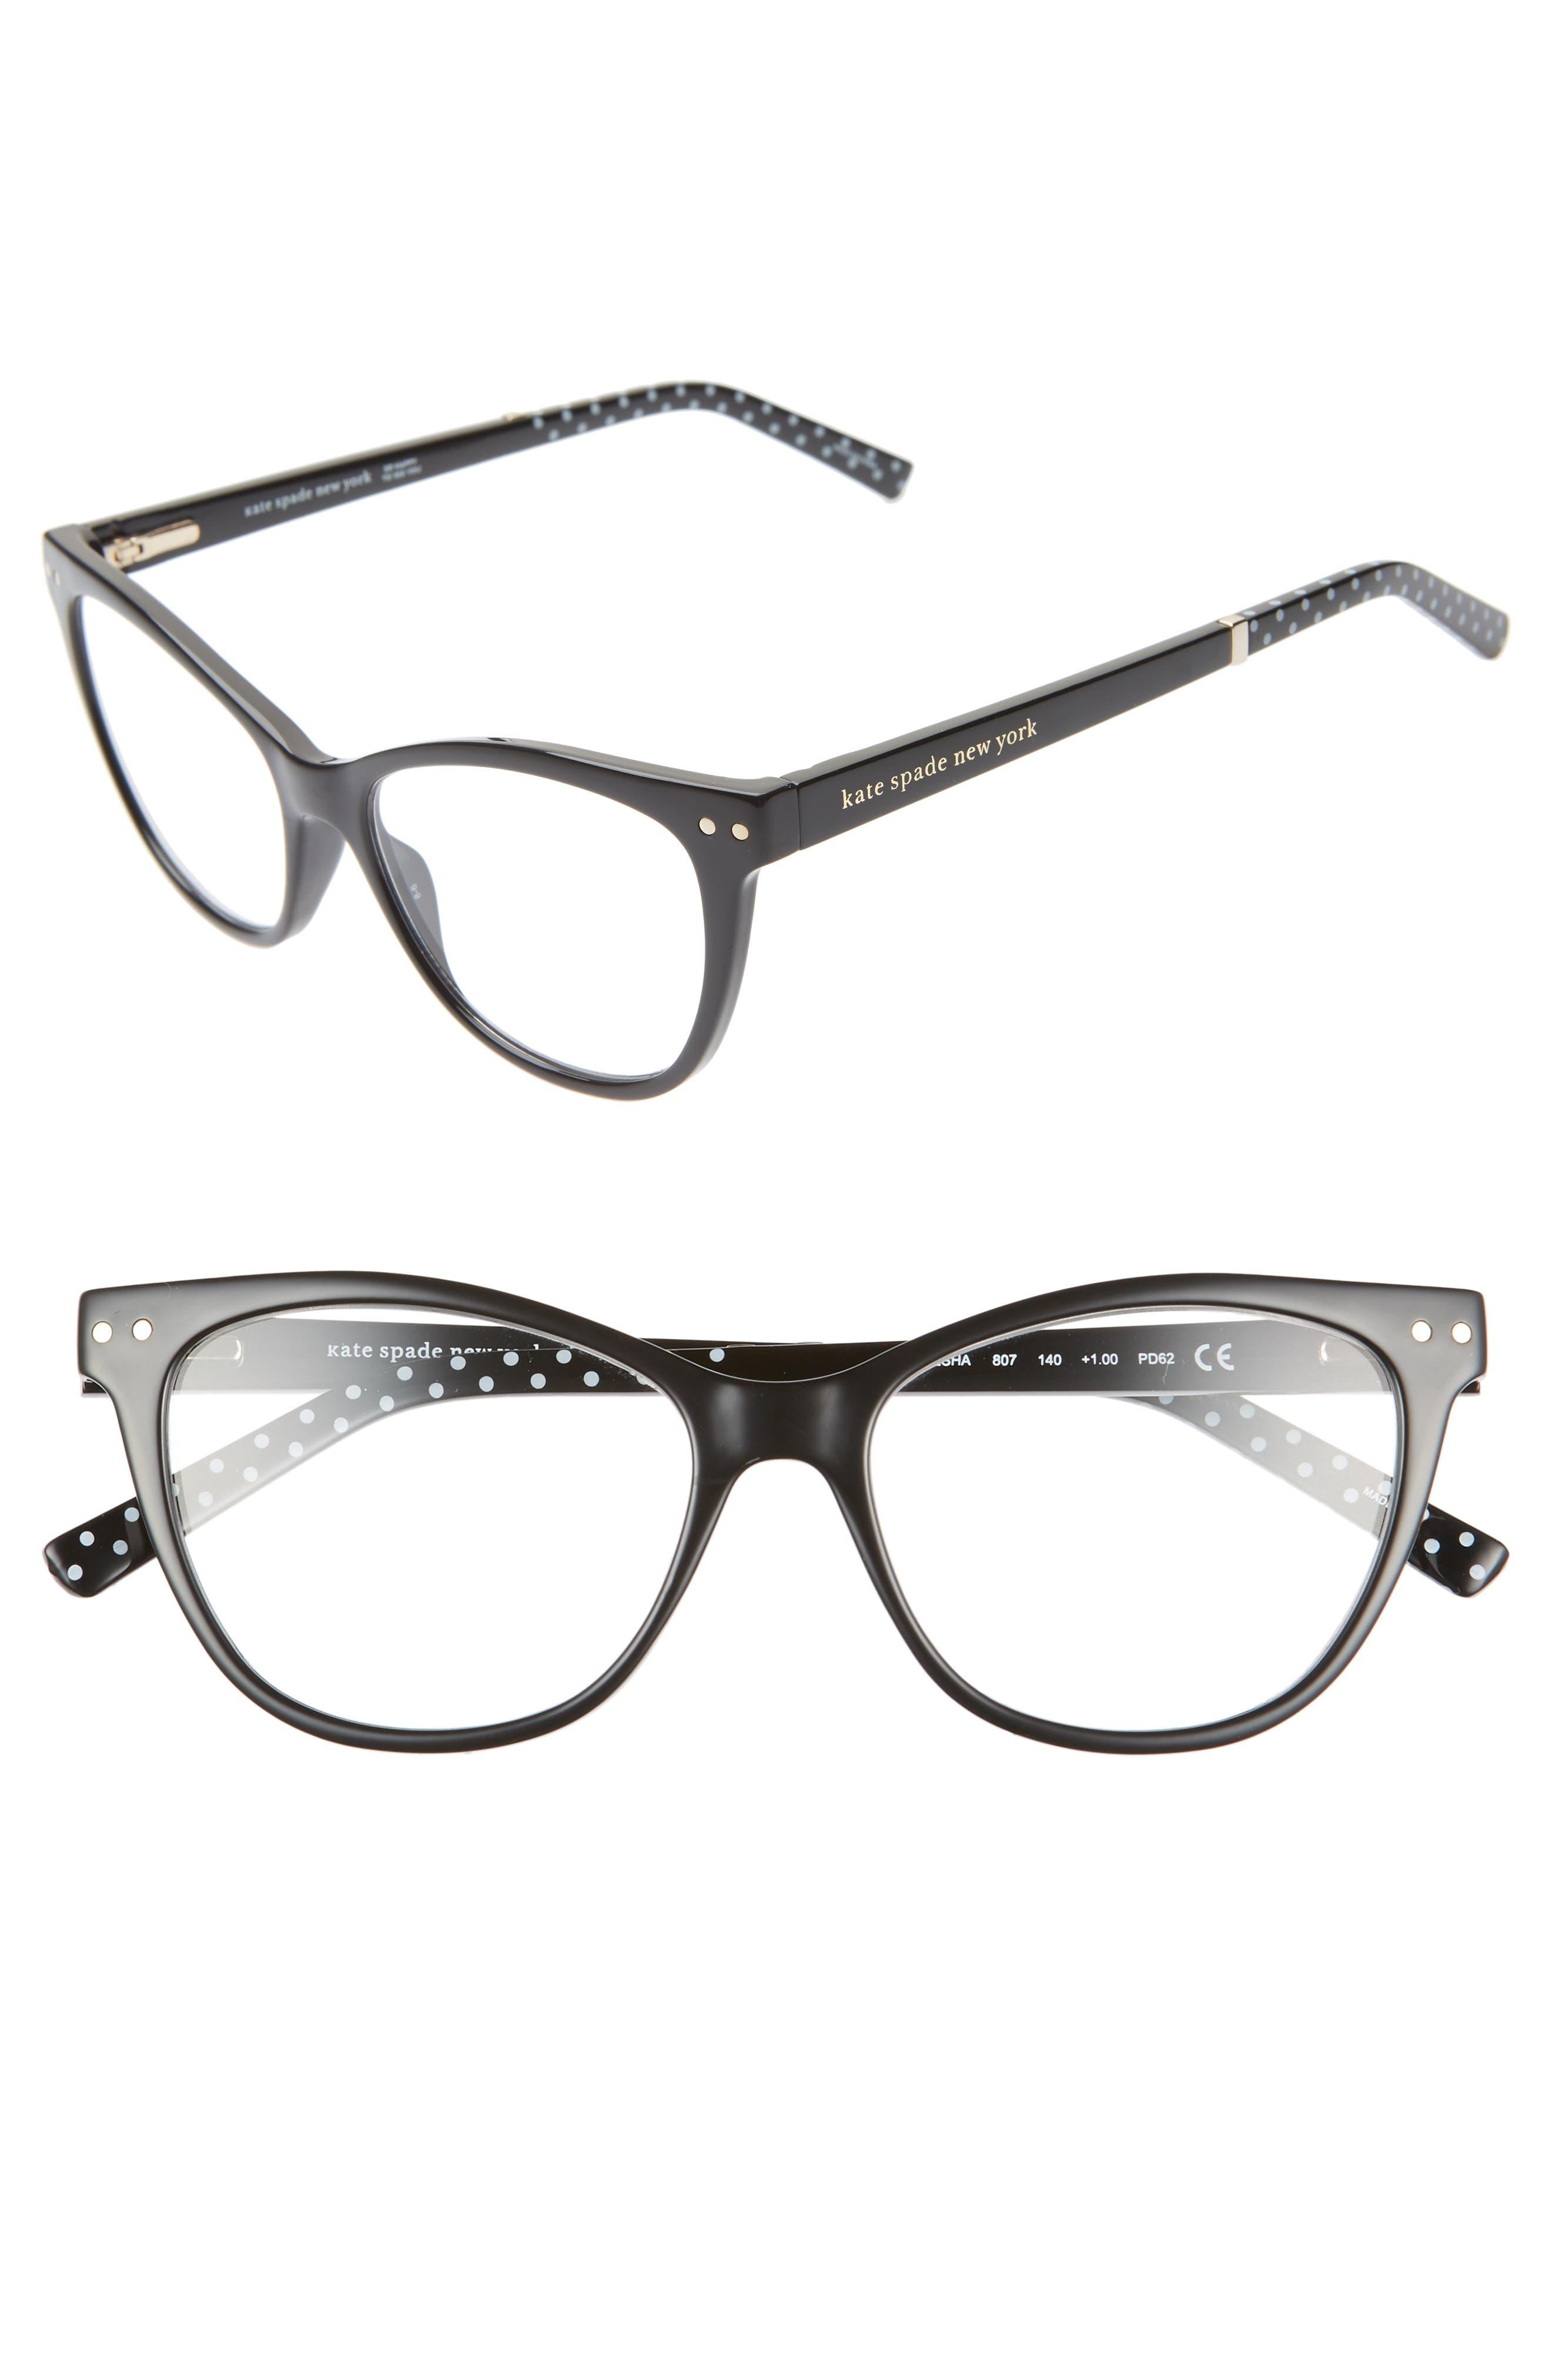 89b9f30dcc66 kate spade reading glasses